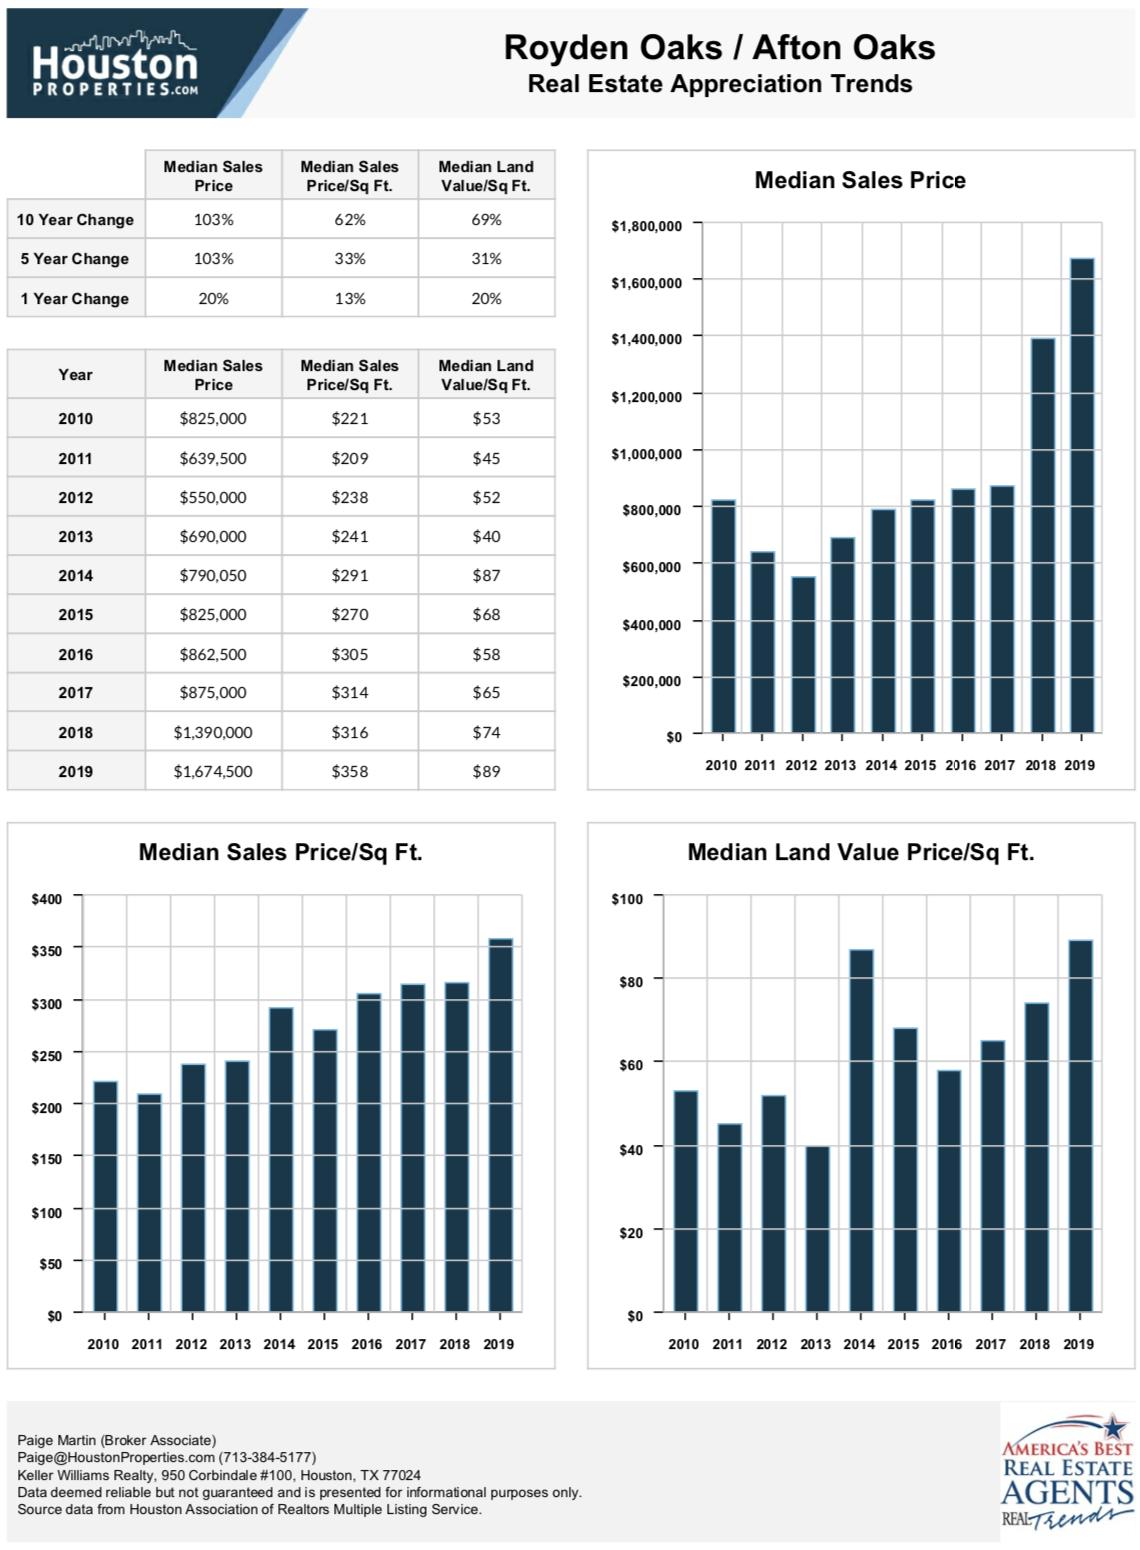 Royden Oaks Real Estate Appreciation Trends